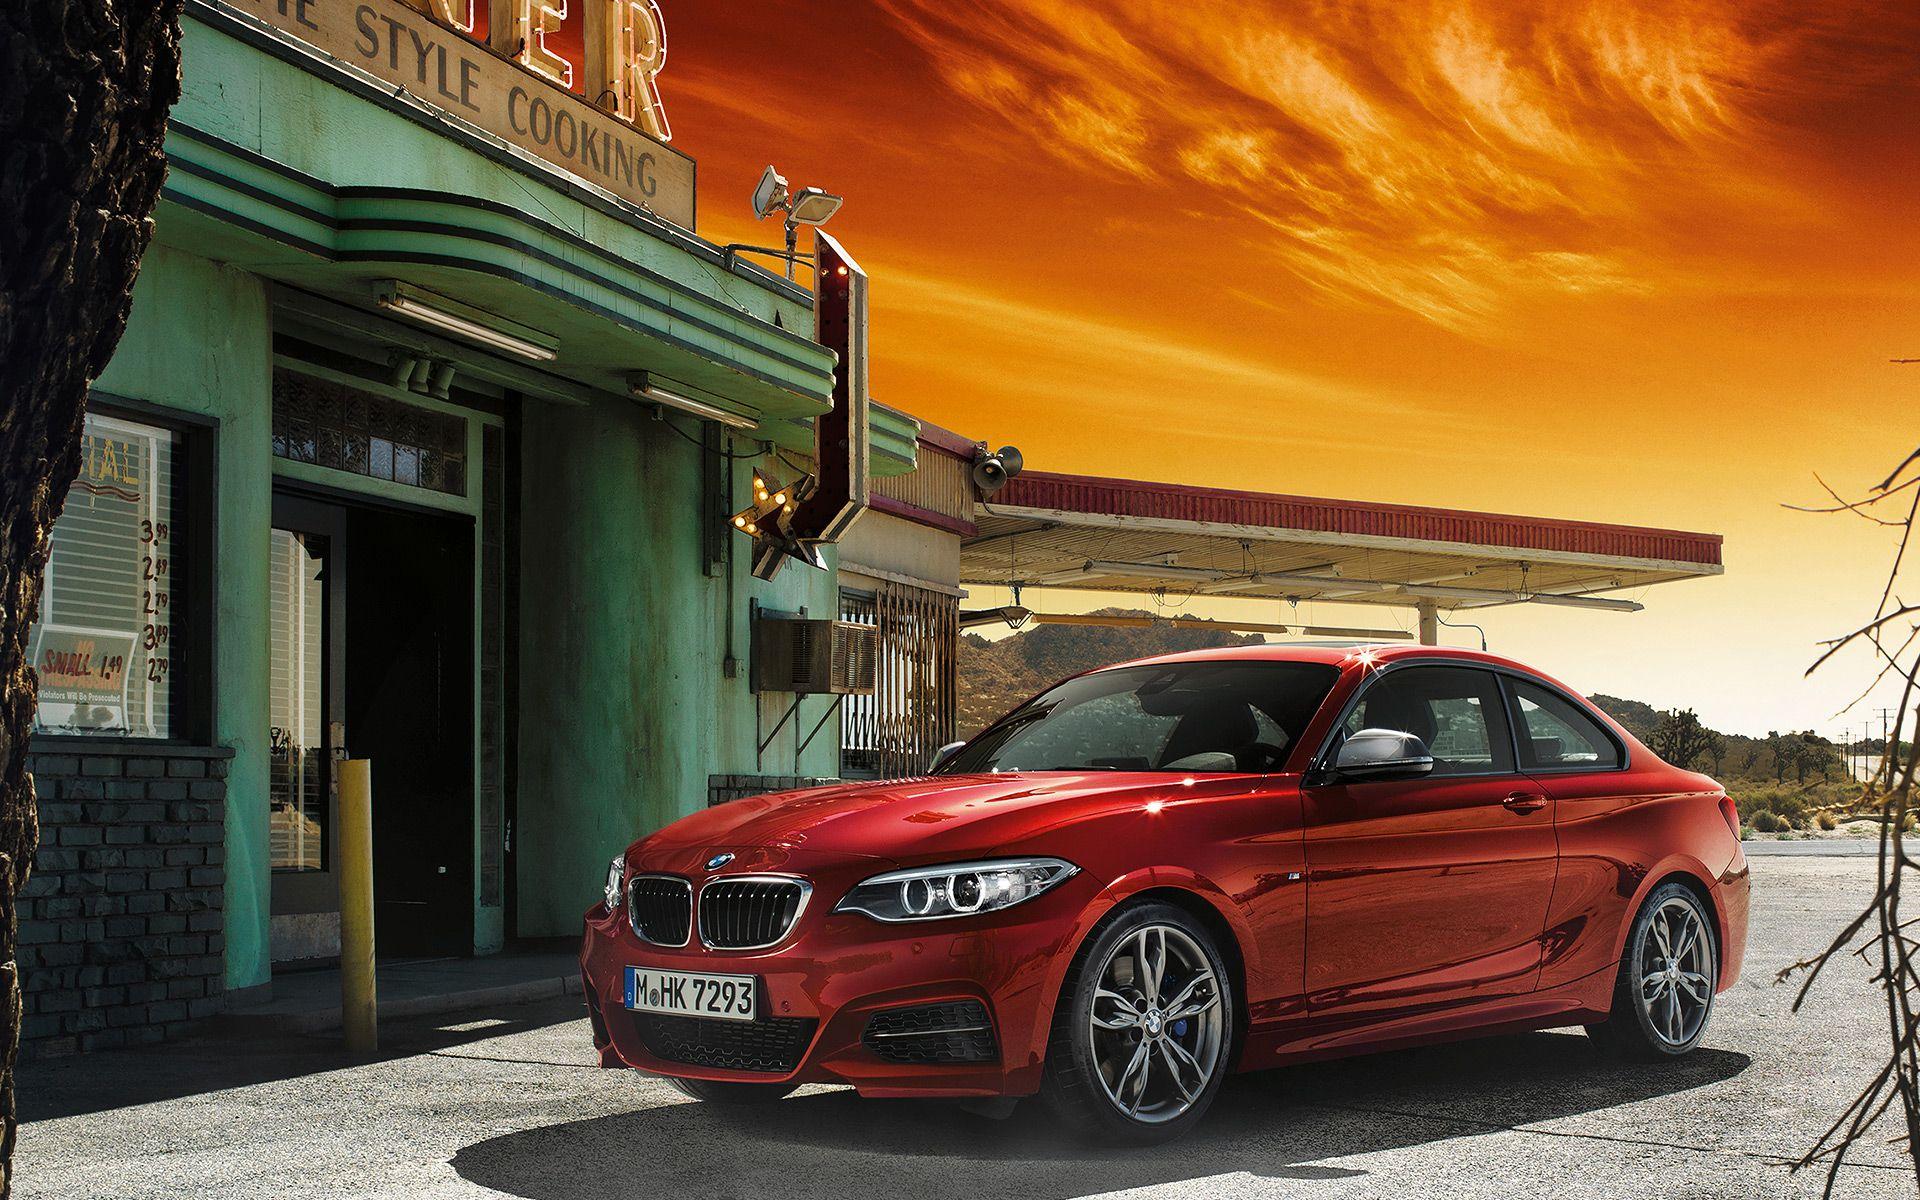 2015 BMW 2 Series Msrp Wallpapers HD - http://wallsauto.com/2015 ...